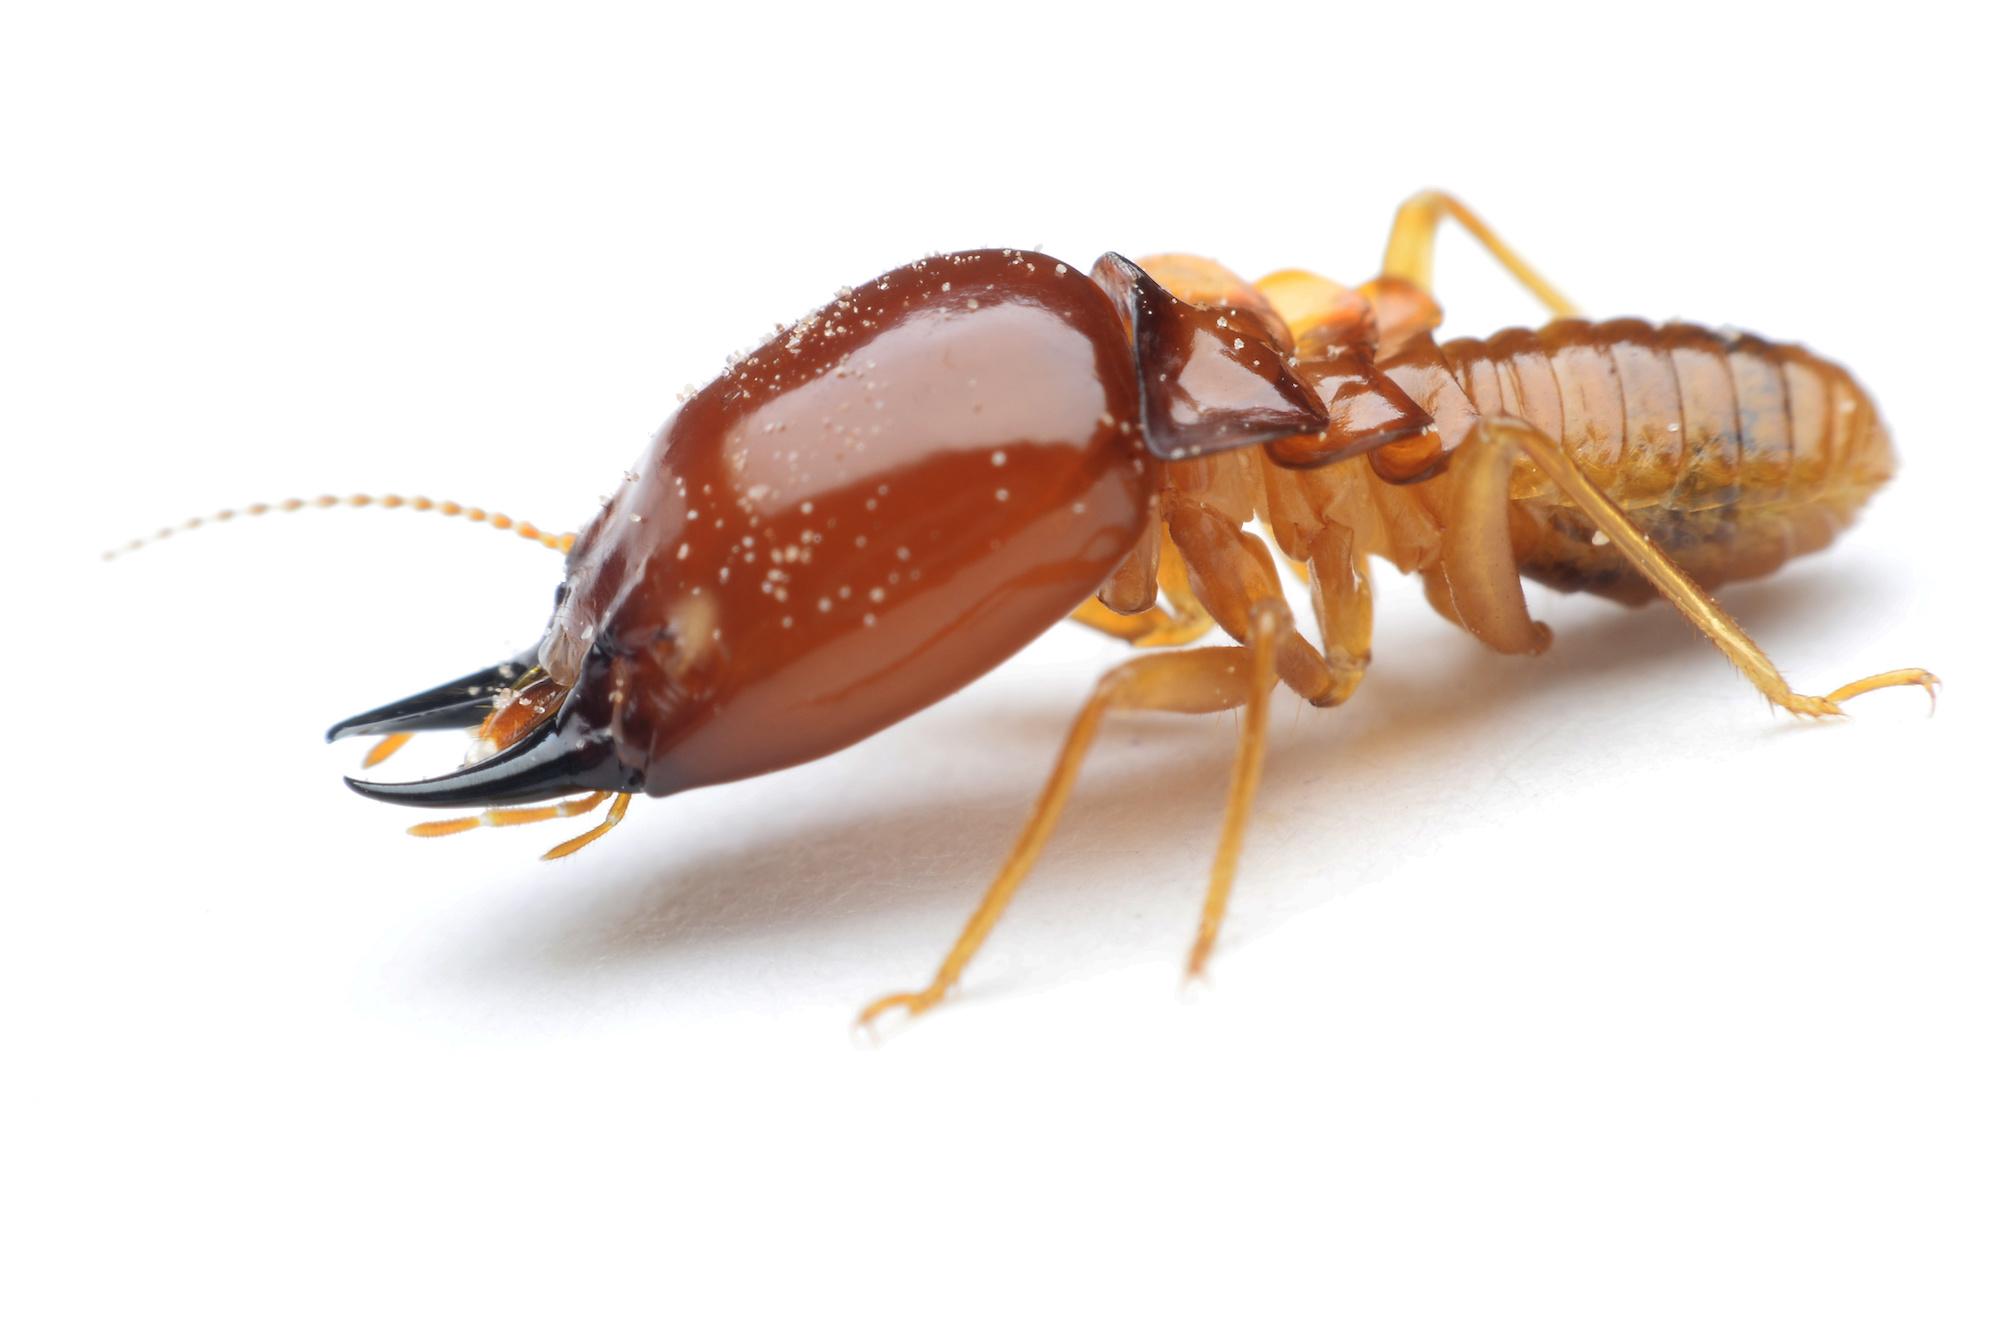 Pest Control Bakersfield, Bakersfield Pest Control Companies, PESTX